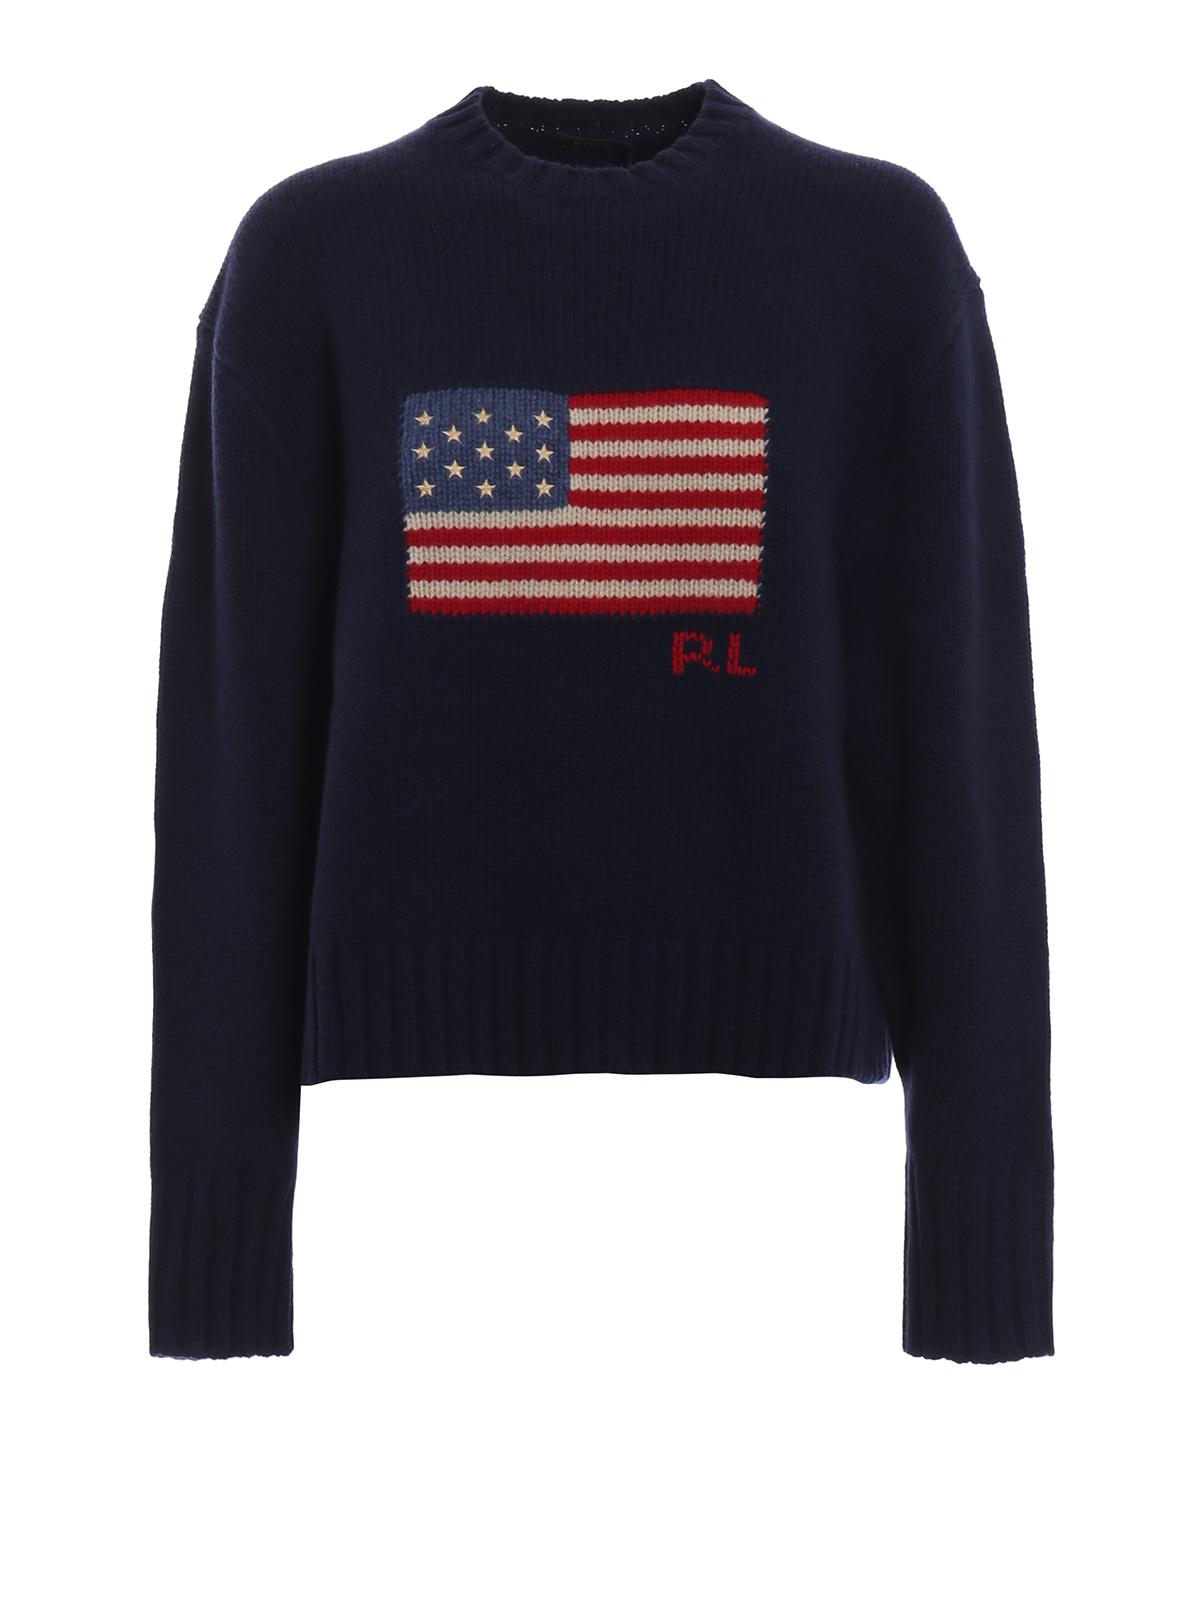 innovative design 032a6 241b9 American flag intarsia wool boxy sweater